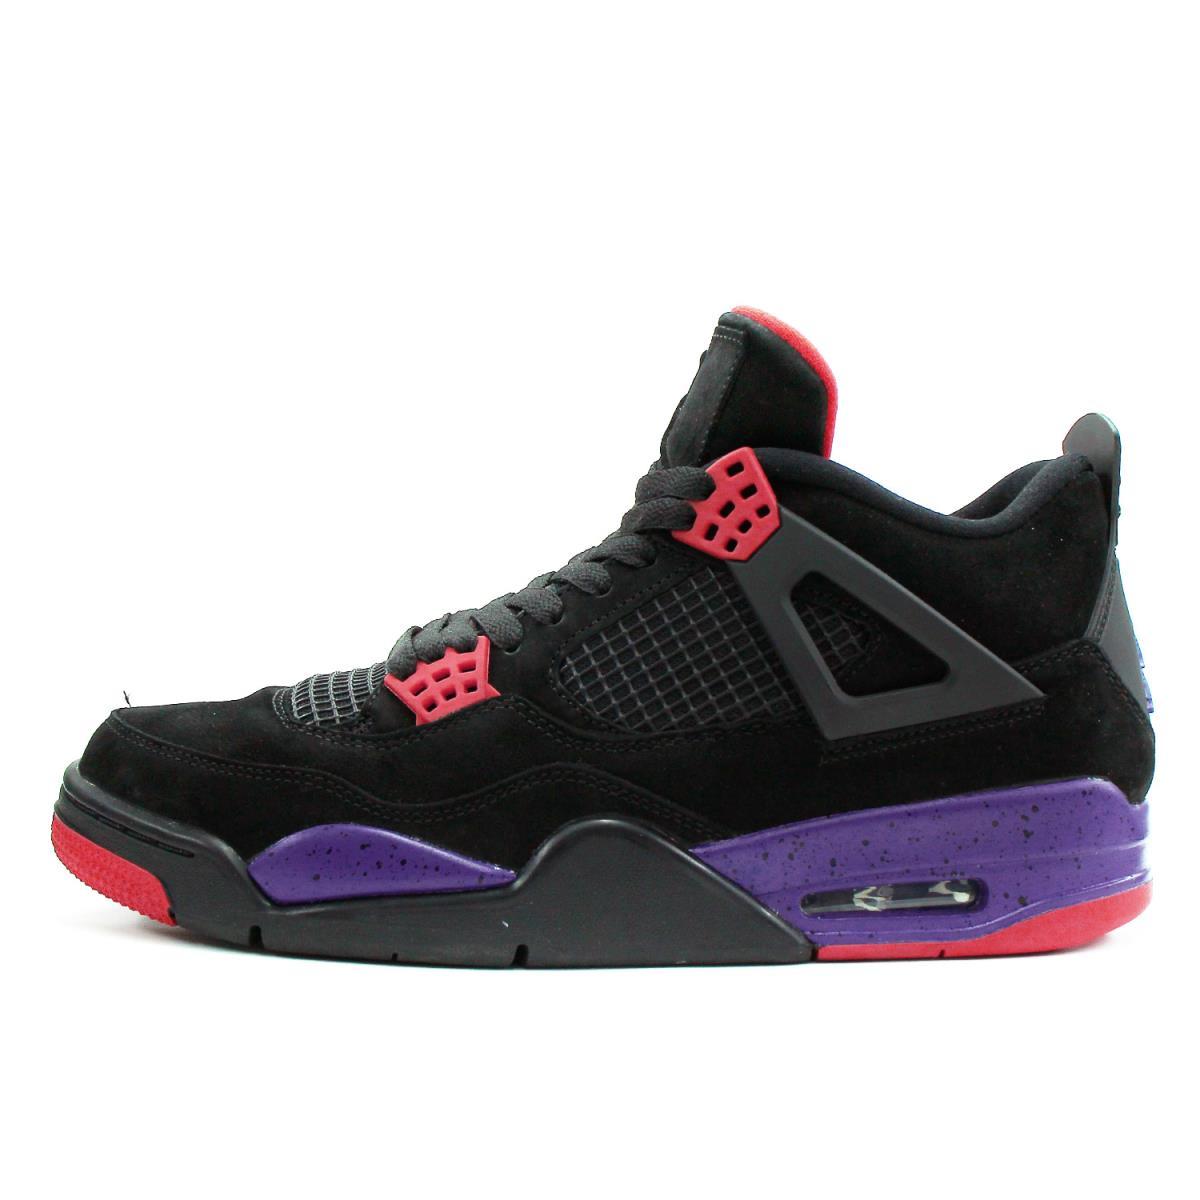 best authentic f507f 3cff8 NIKE (Nike) AIR JORDAN 4 RETRO NRG RAPTORS (AQ3816-065) black X coat purple  US10.5(28.5cm)